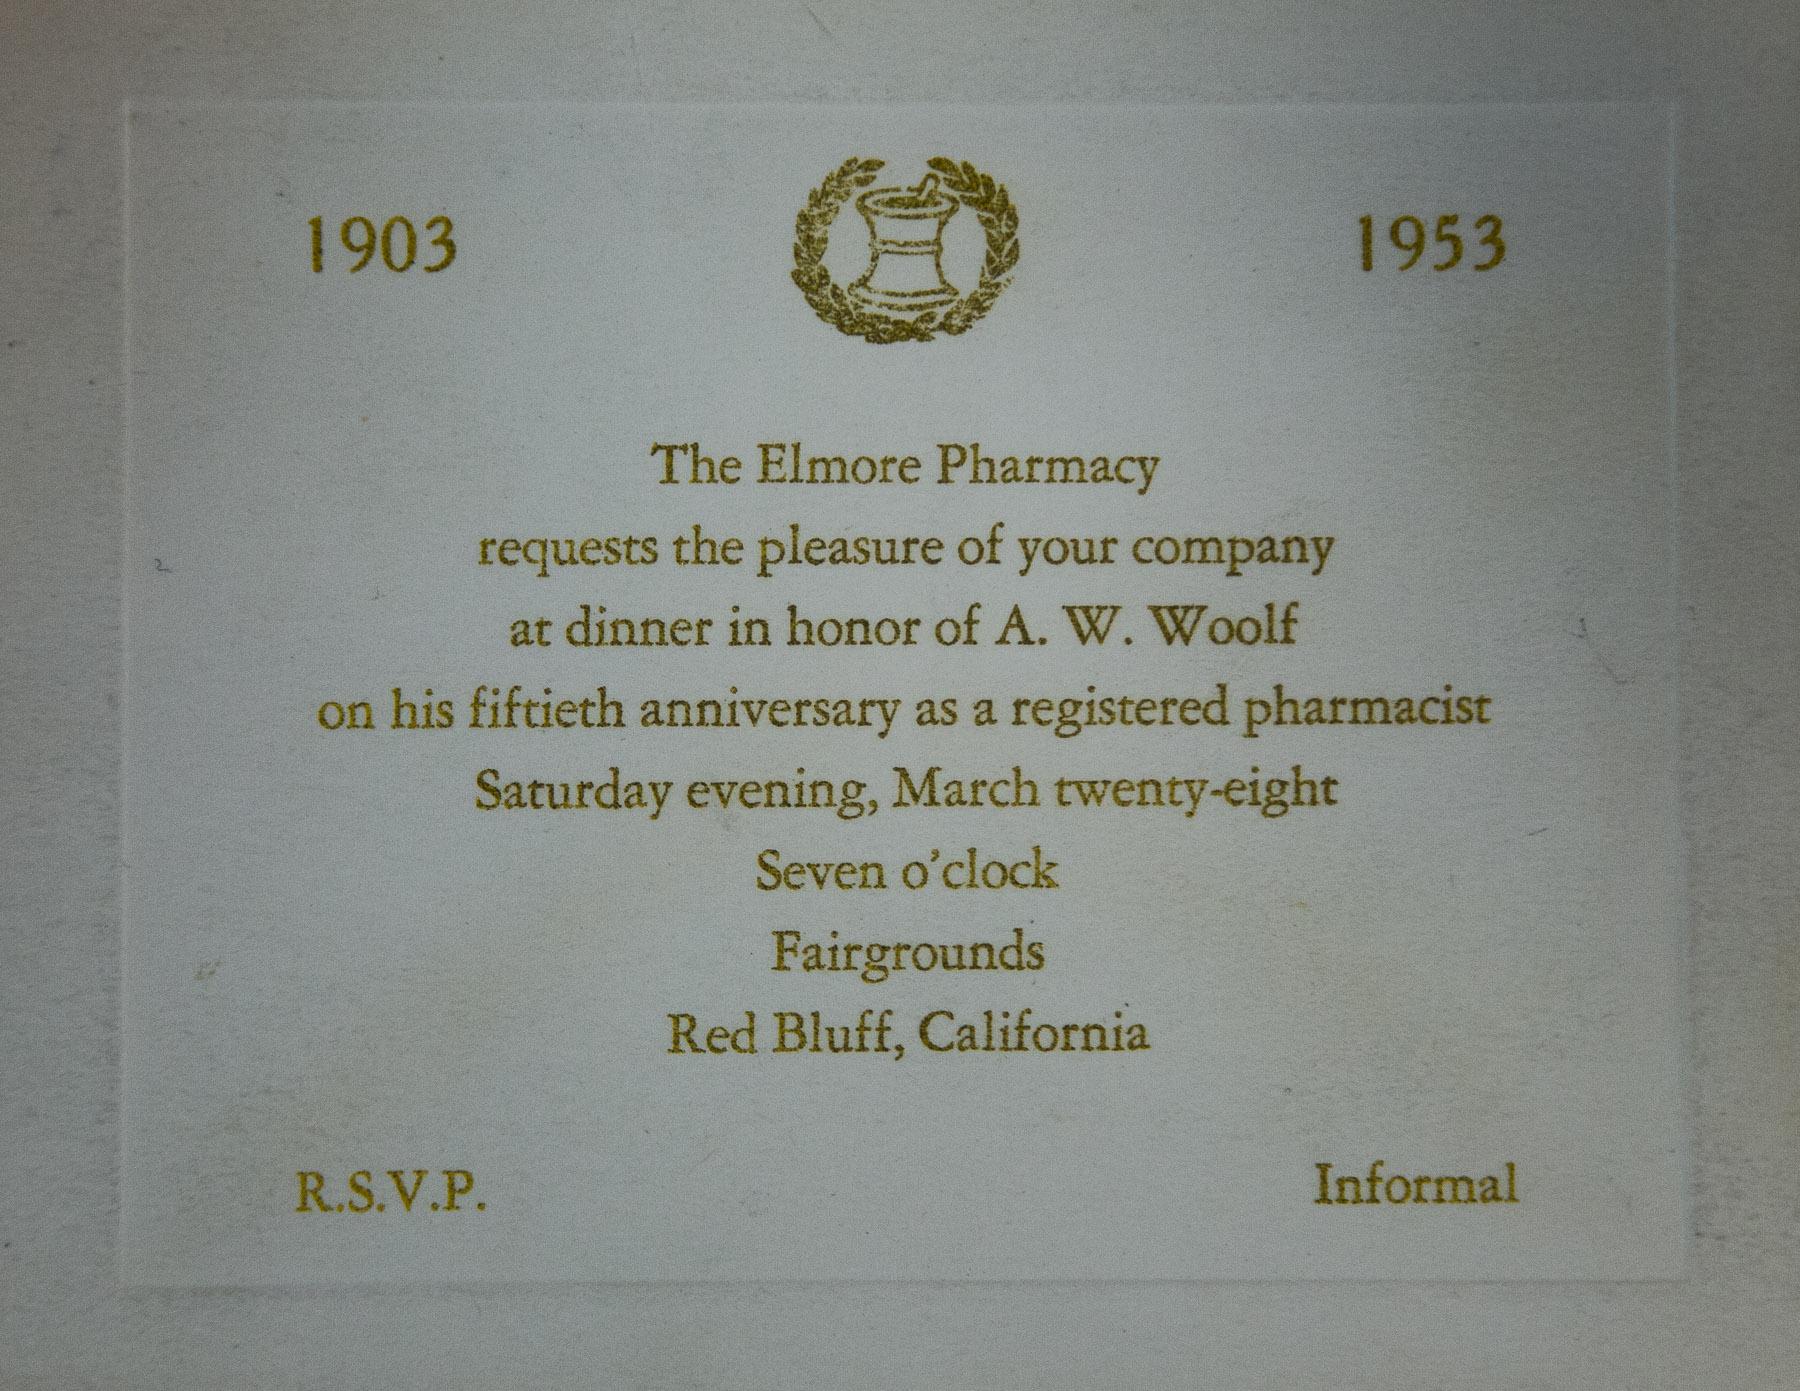 1953 Elmore Pharmacy A. W. Woolf 50th Anniversary as a Pharmacist